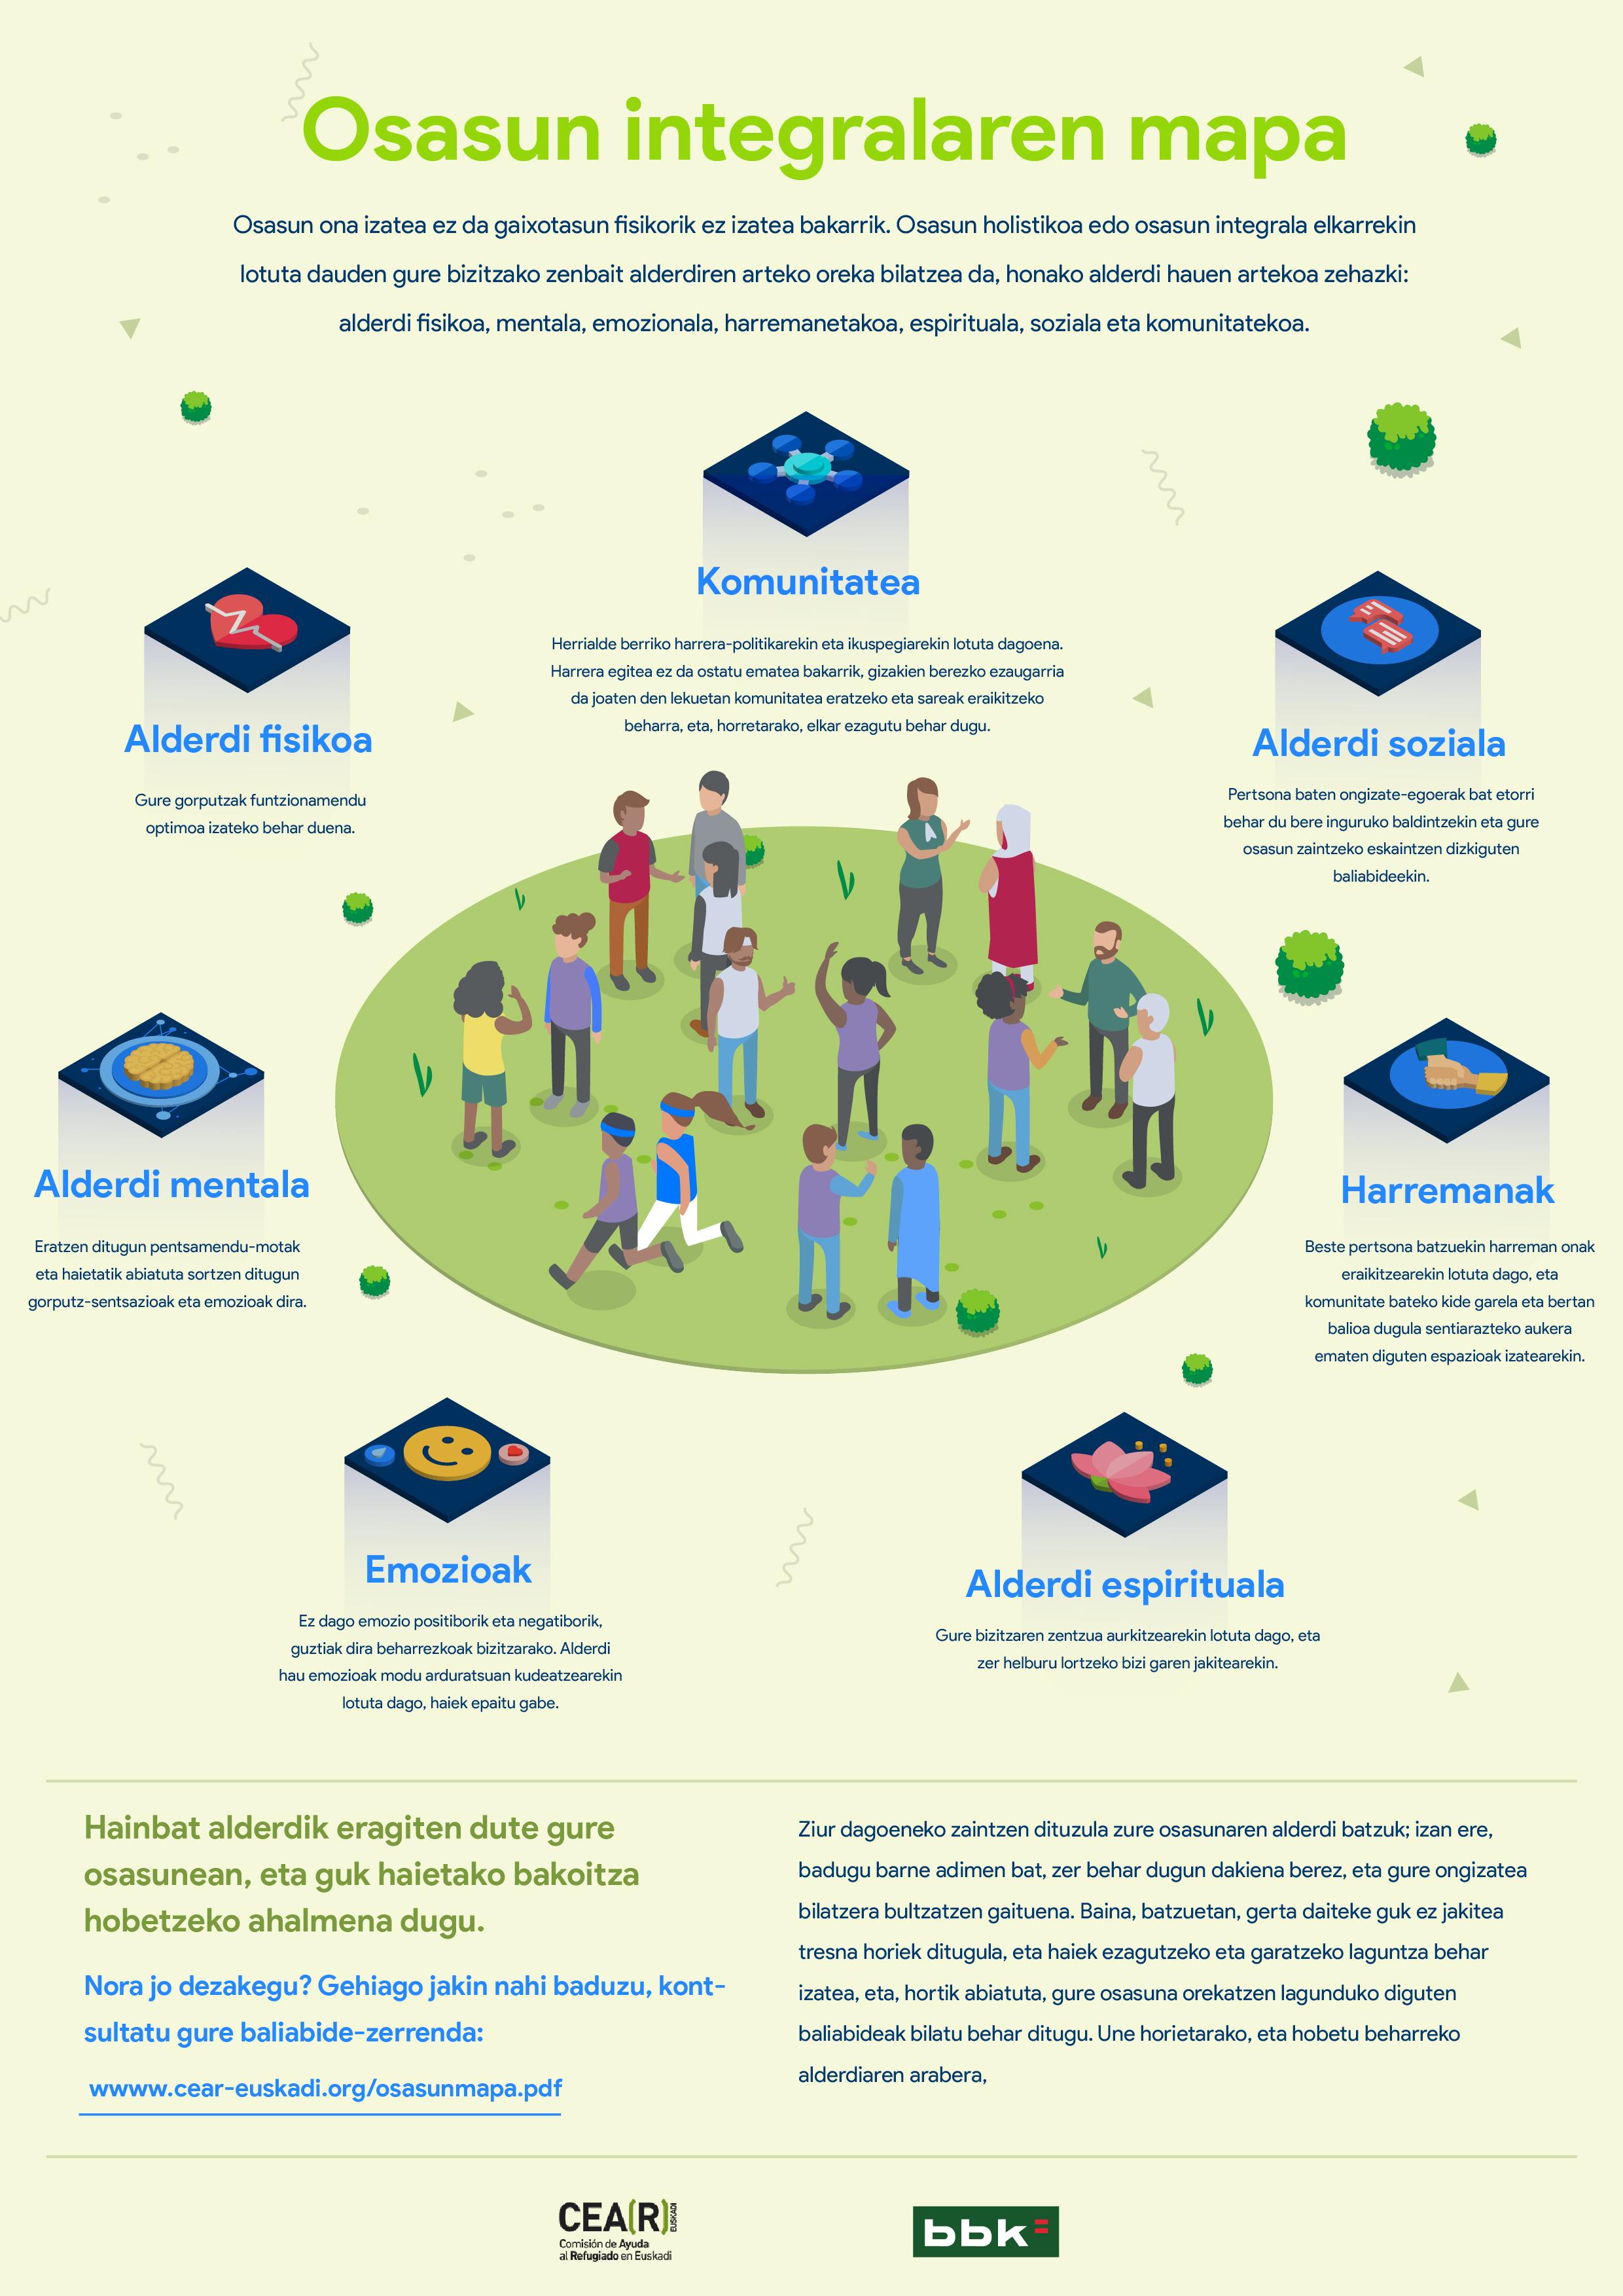 Infografia-eu-alta (1) - CEAR-Euskadi